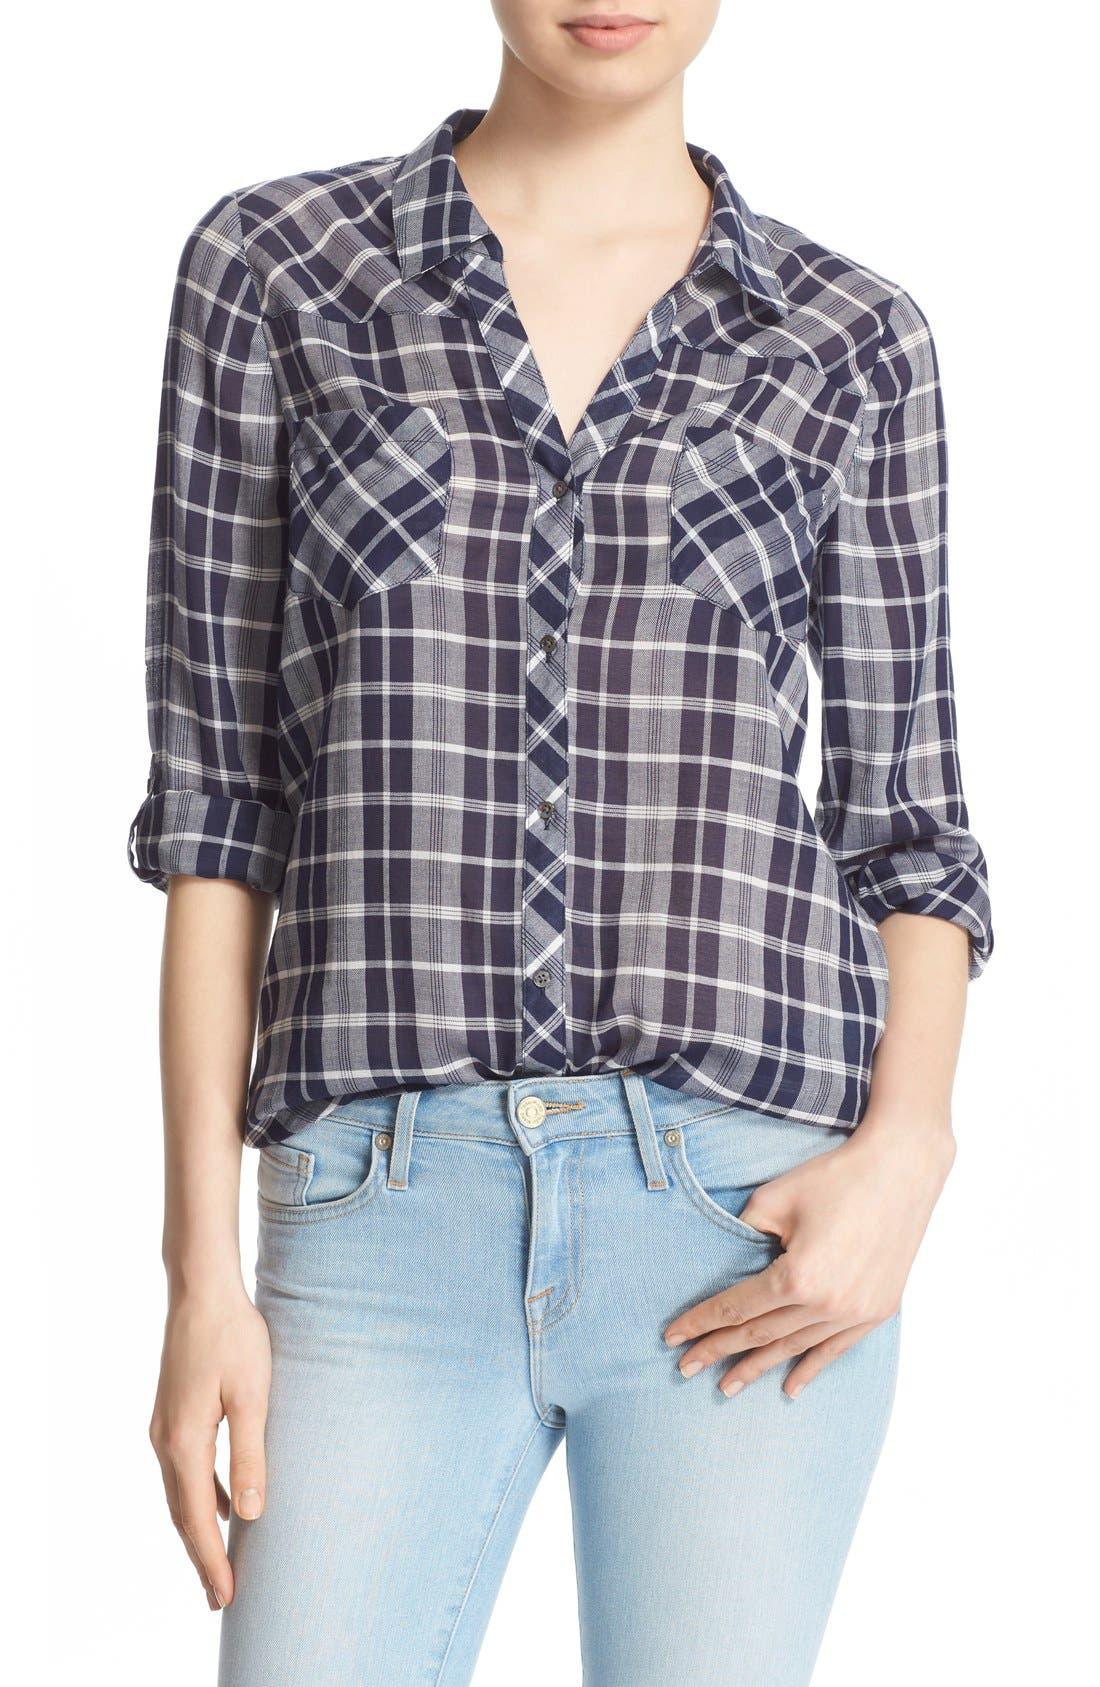 Alternate Image 1 Selected - Soft Joie 'Daesha' Plaid Shirt